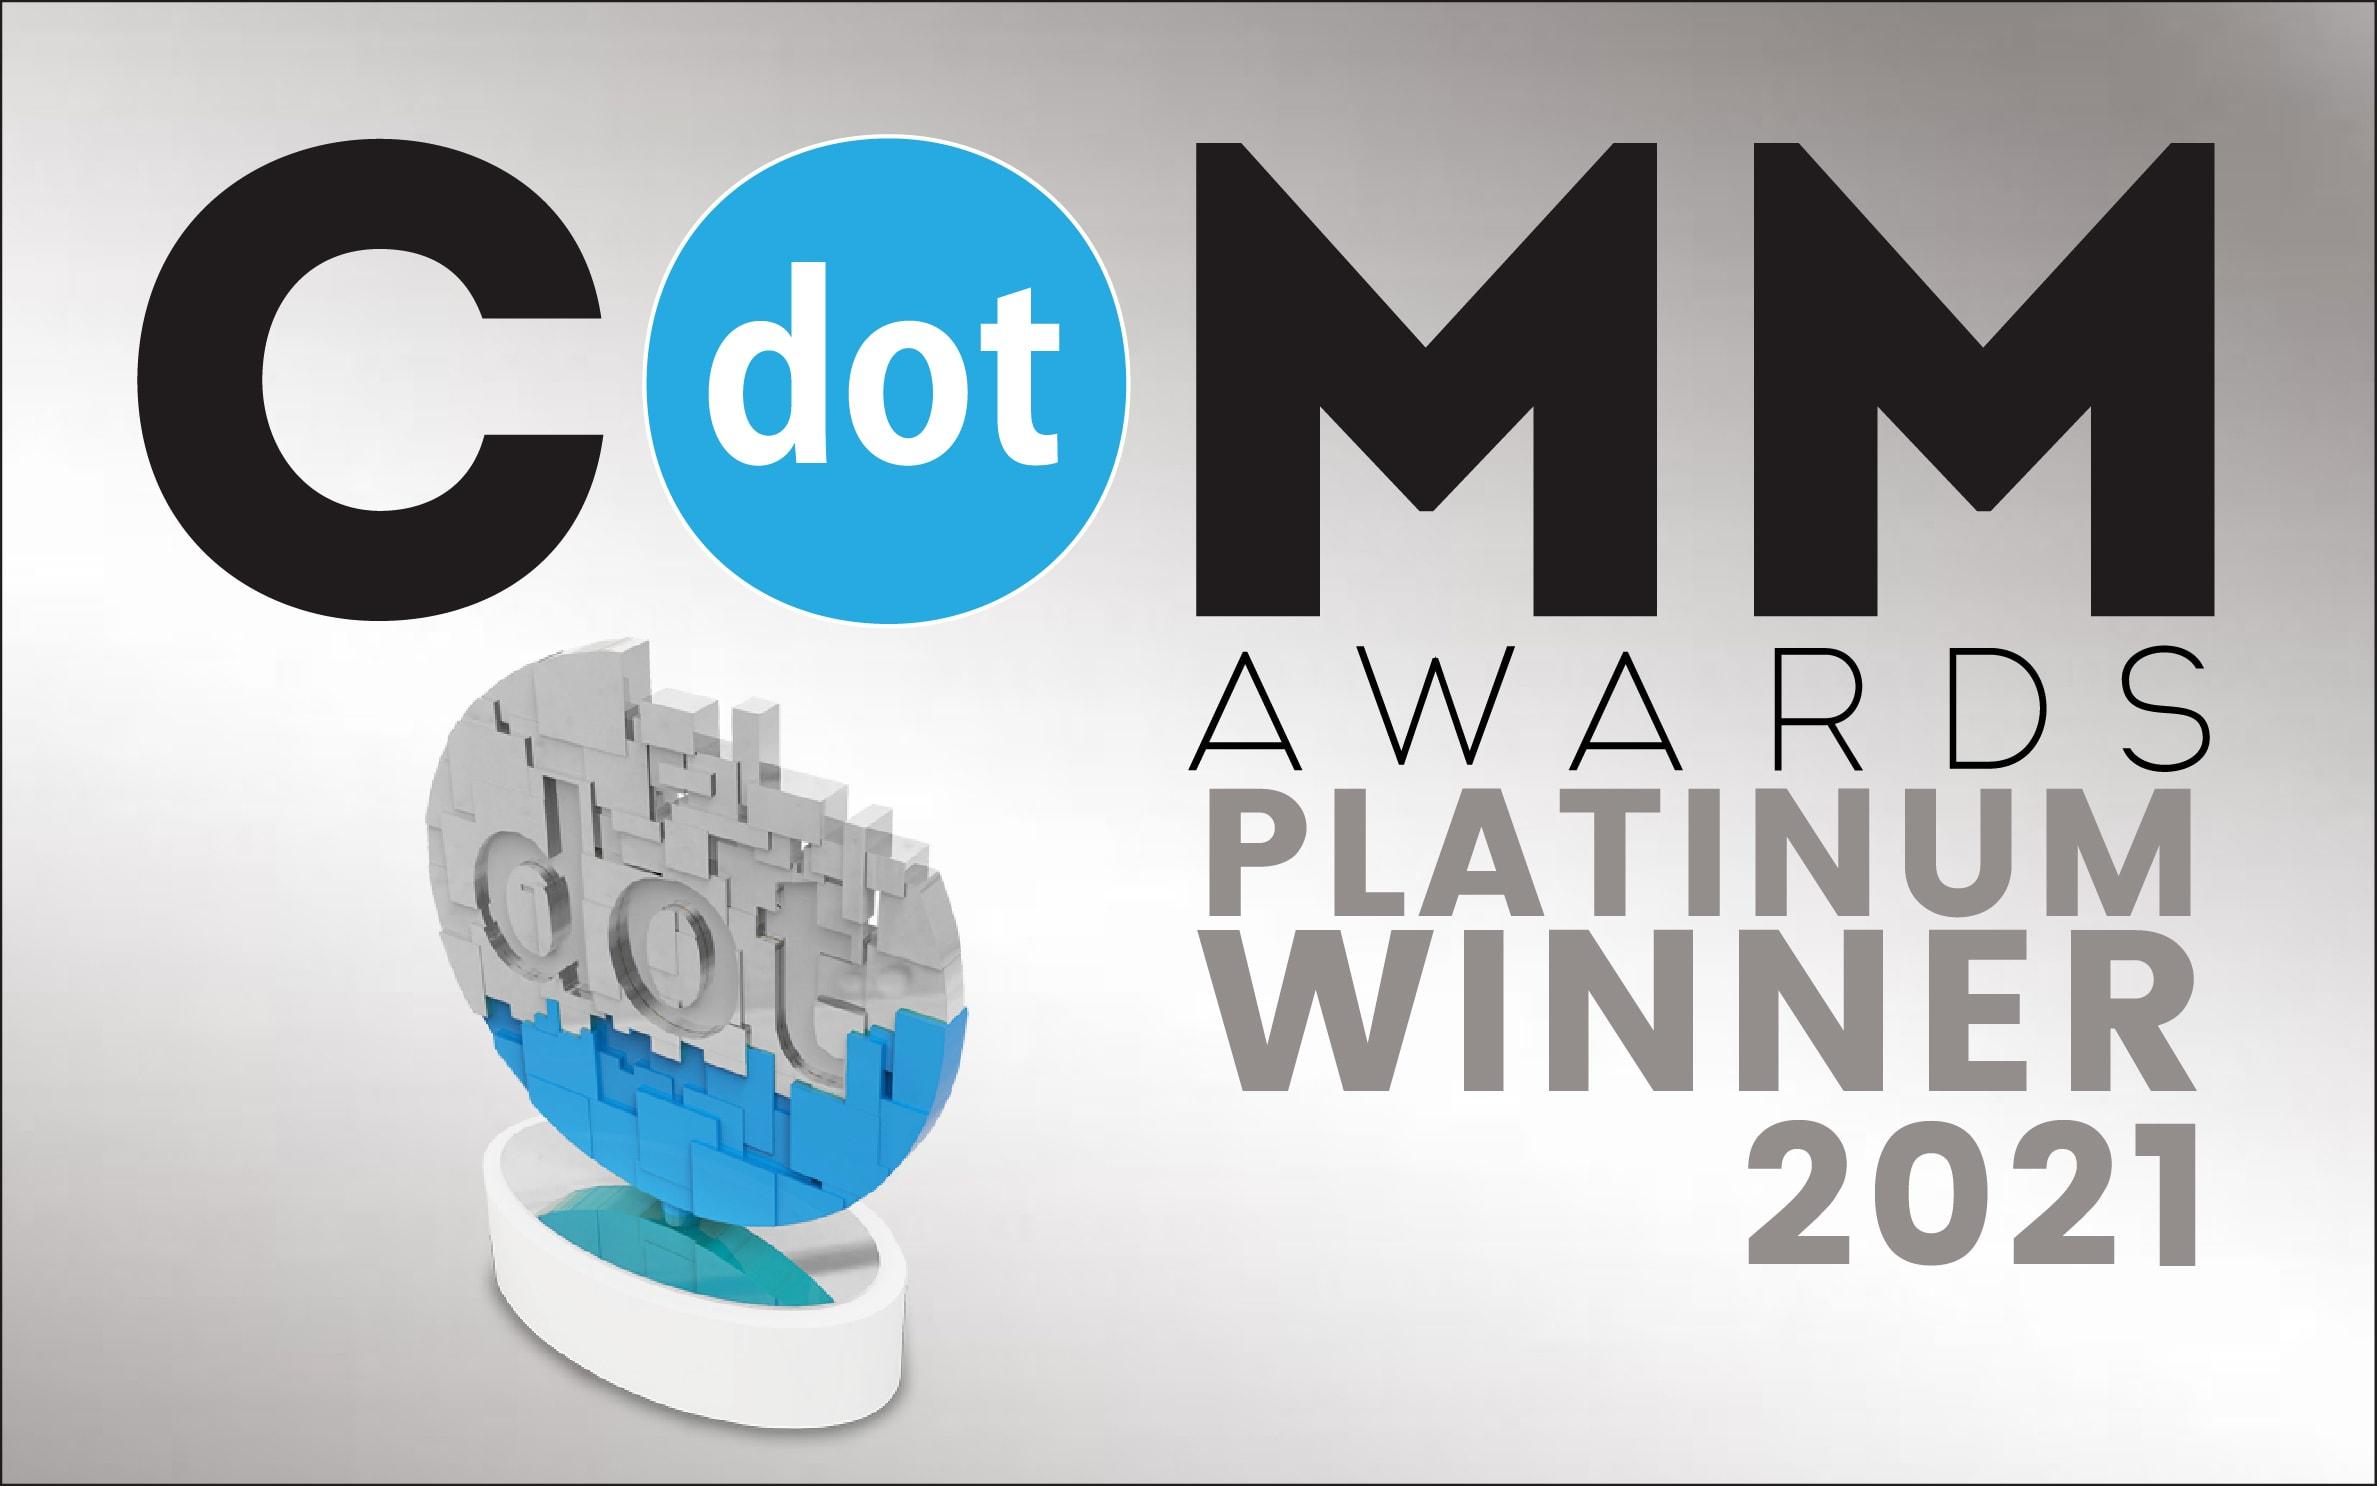 dotCOMM Awards Platinum Winner 2021